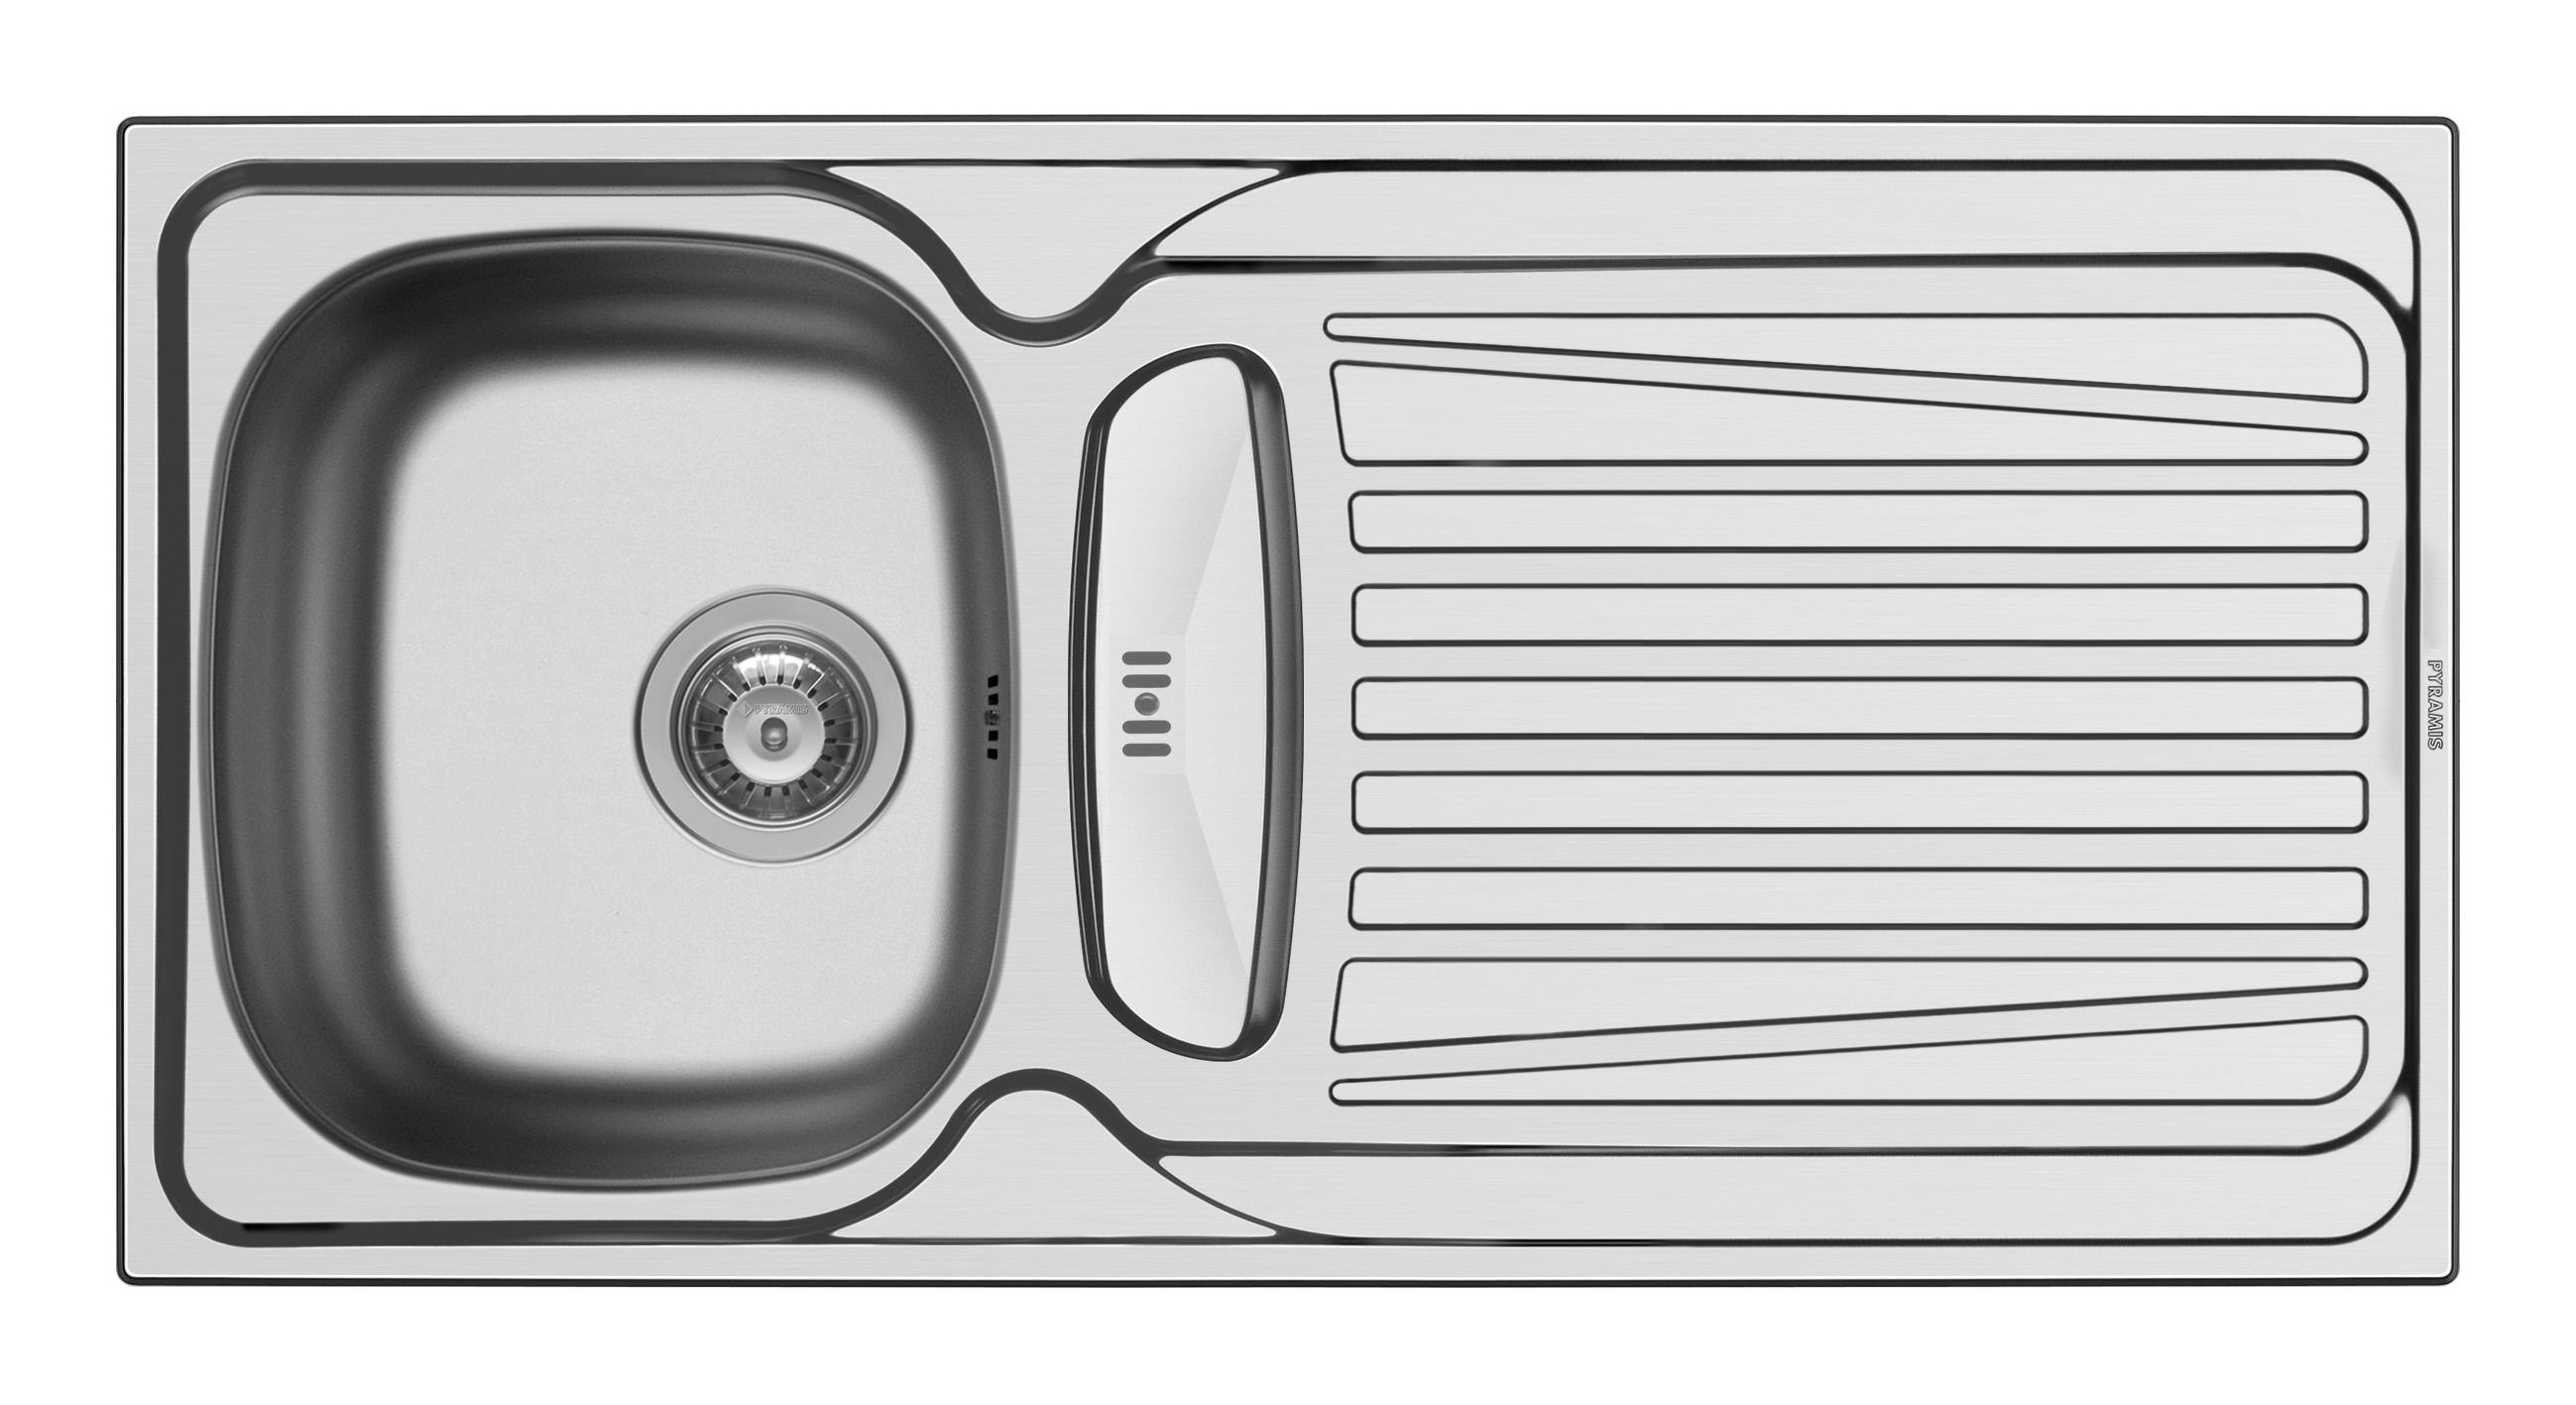 Küchenspüle Spüle Einbauspüle Edelstahlspüle Spülbecken Edelstahl 100x50 Pyramis